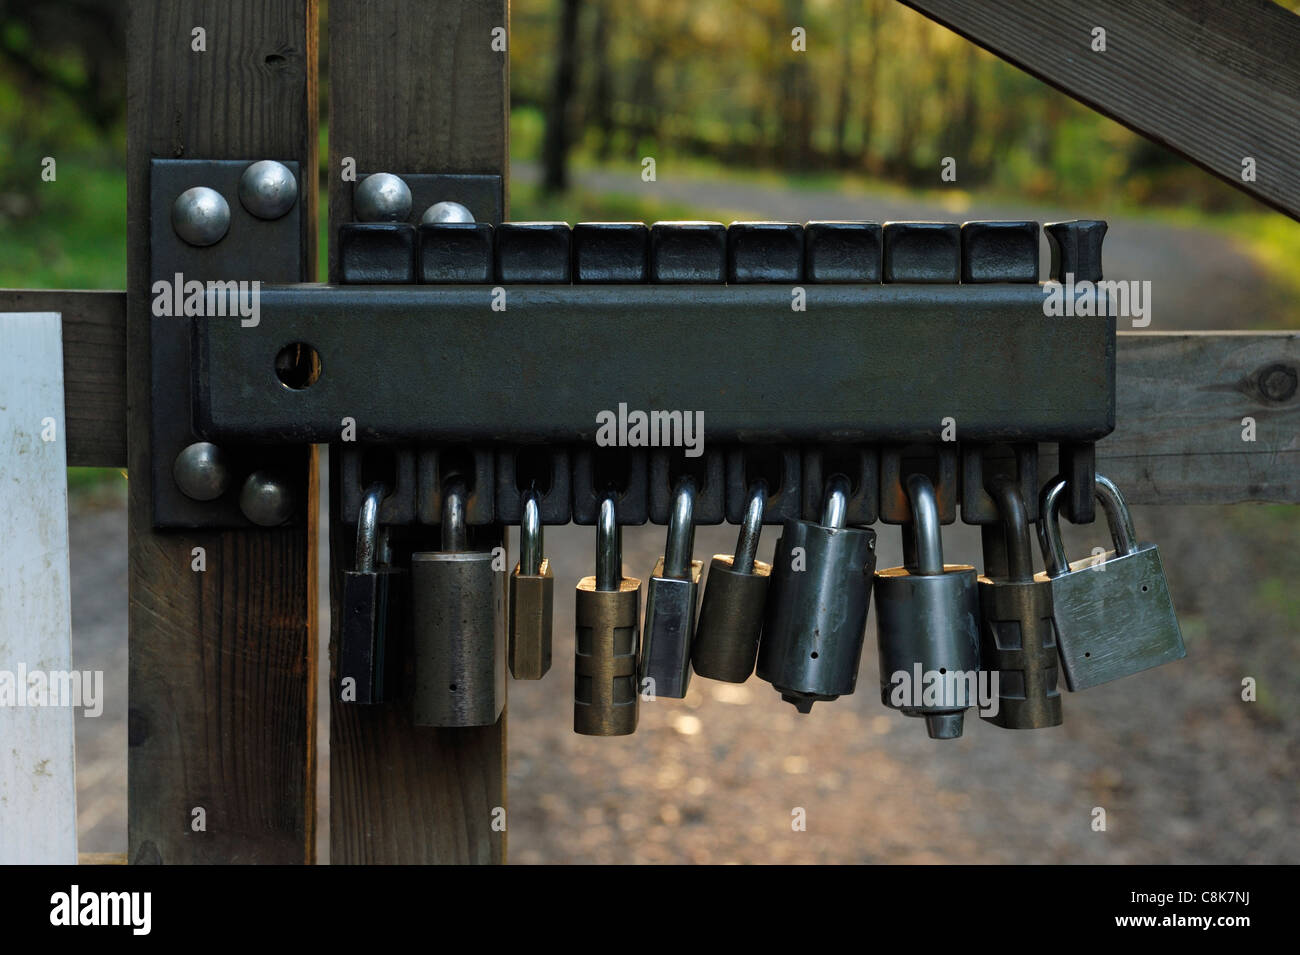 Group lockout padlock concept - Stock Image